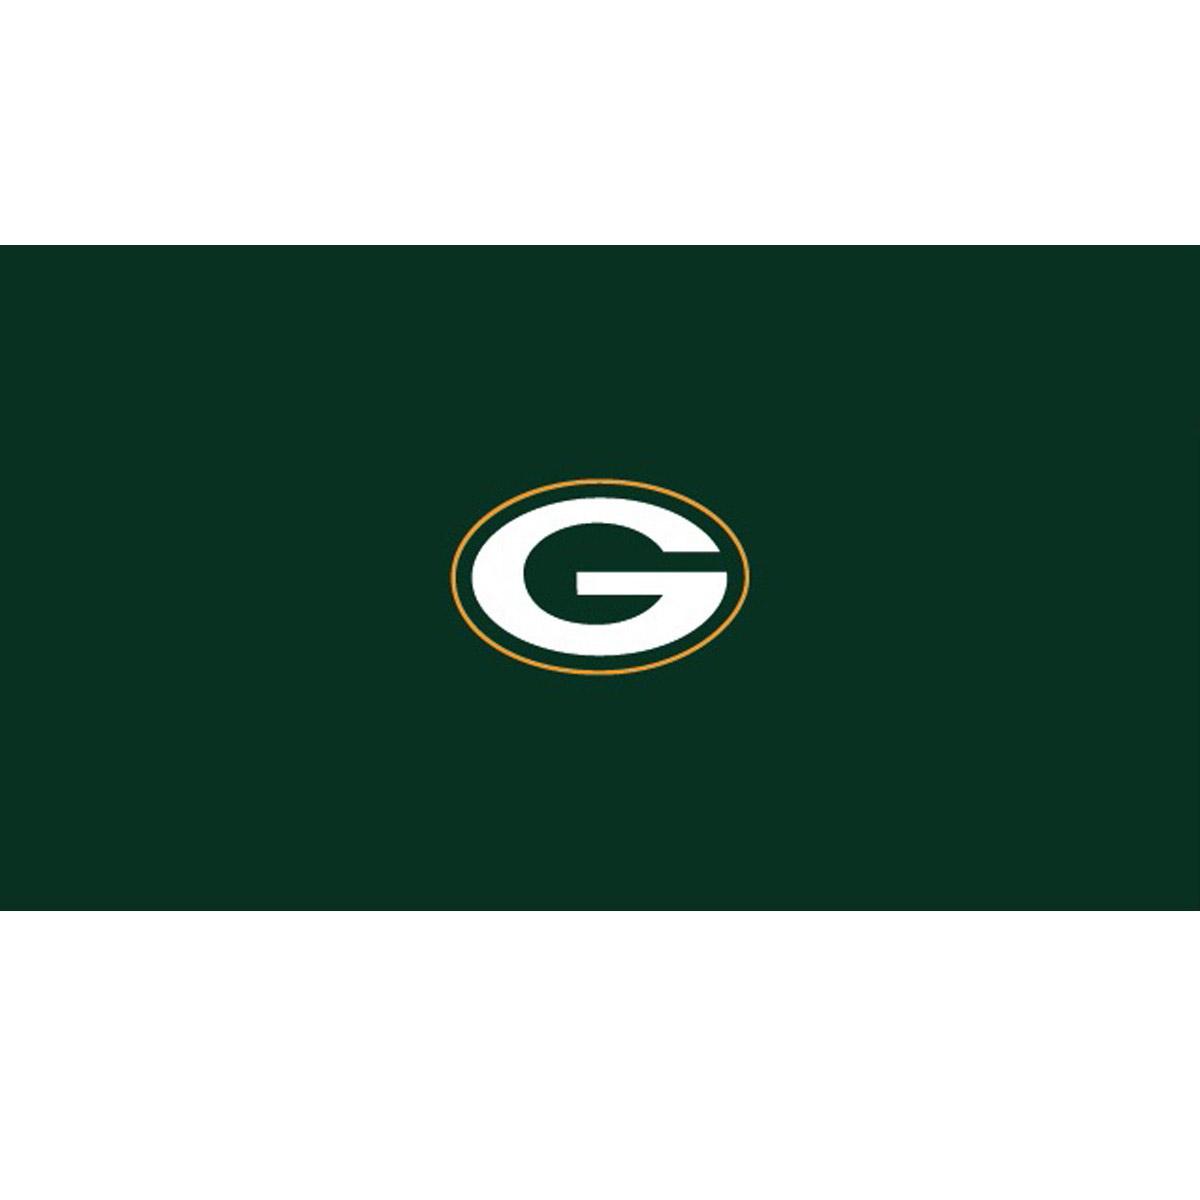 GREEN BAY PACKERS 8-FOOT BILLIARD CLOTH